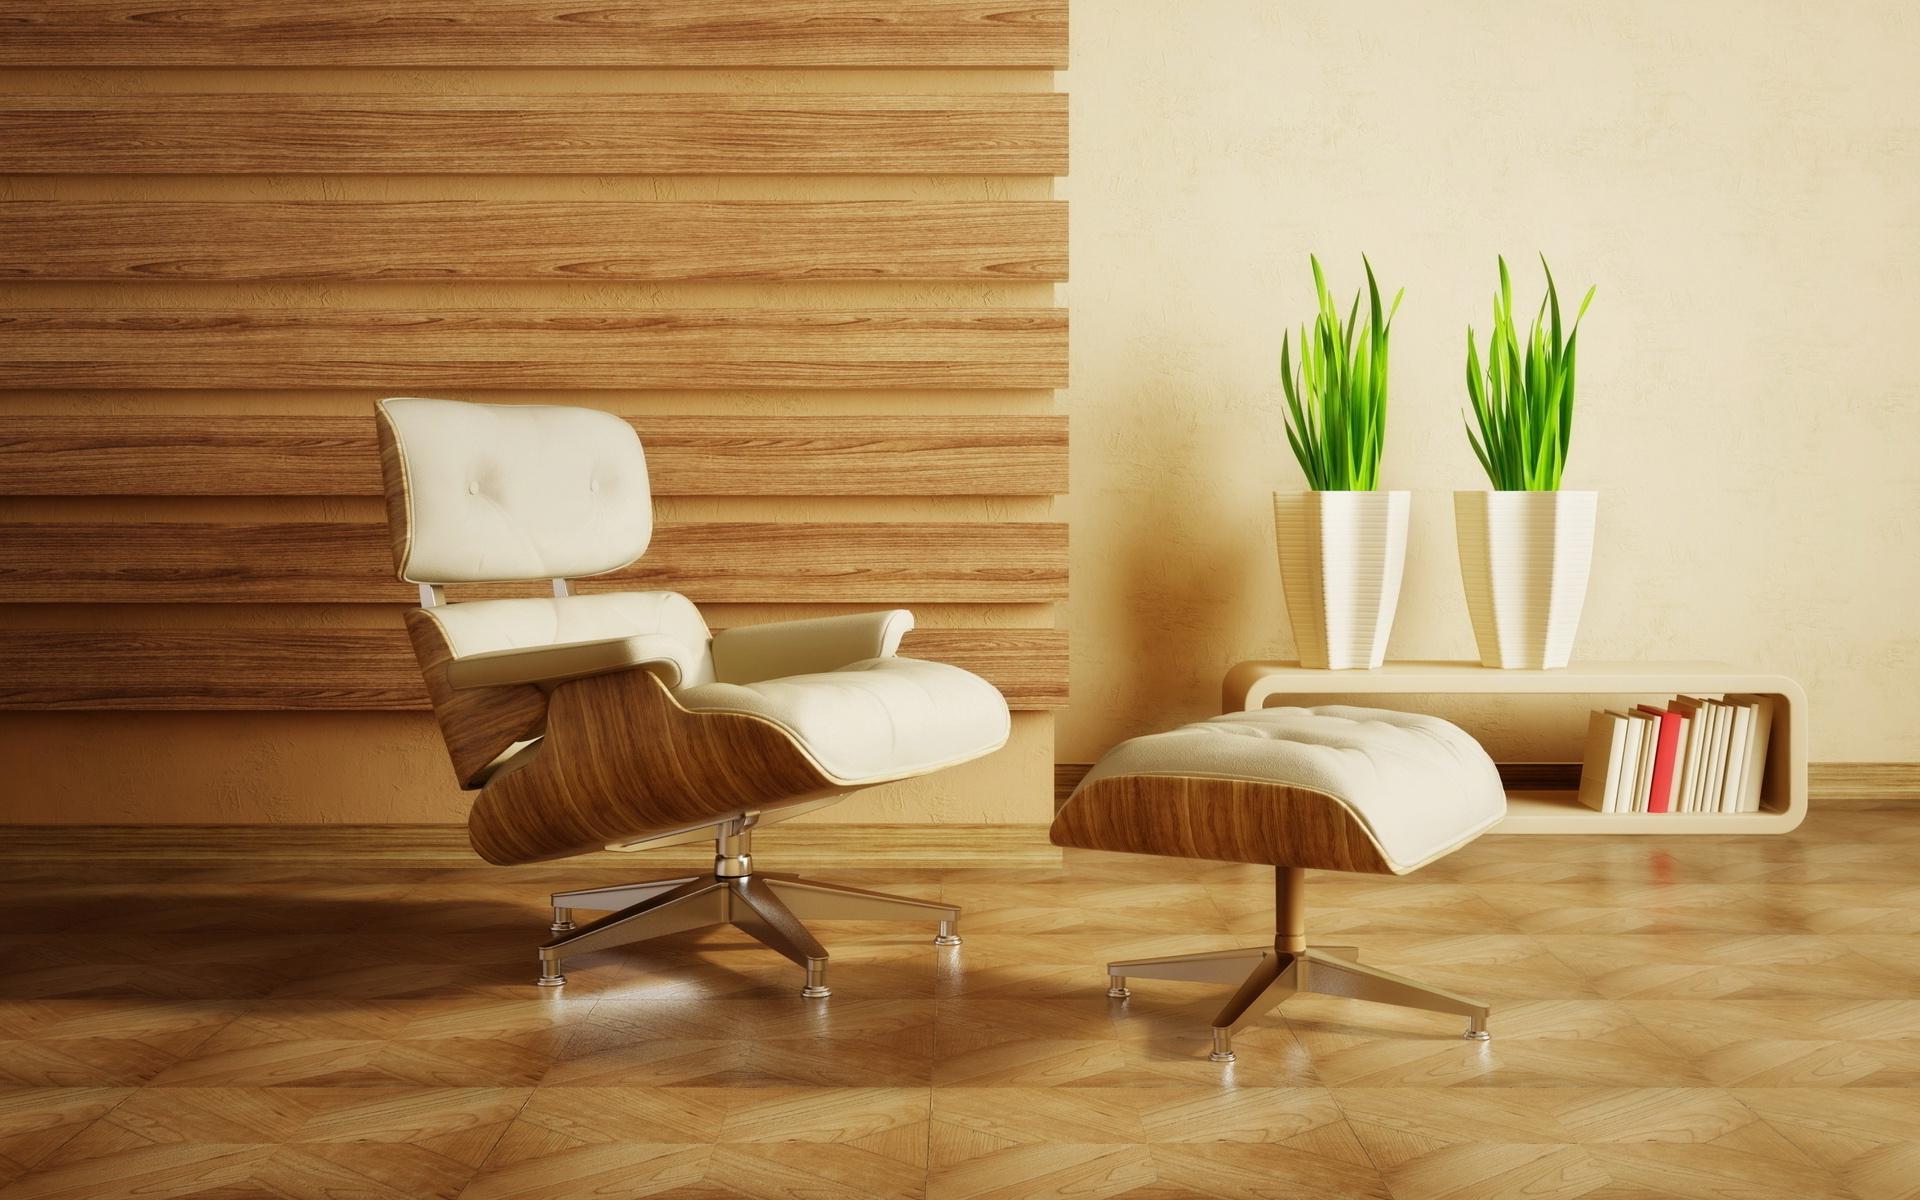 furniture computer wallpapers desktop - photo #4